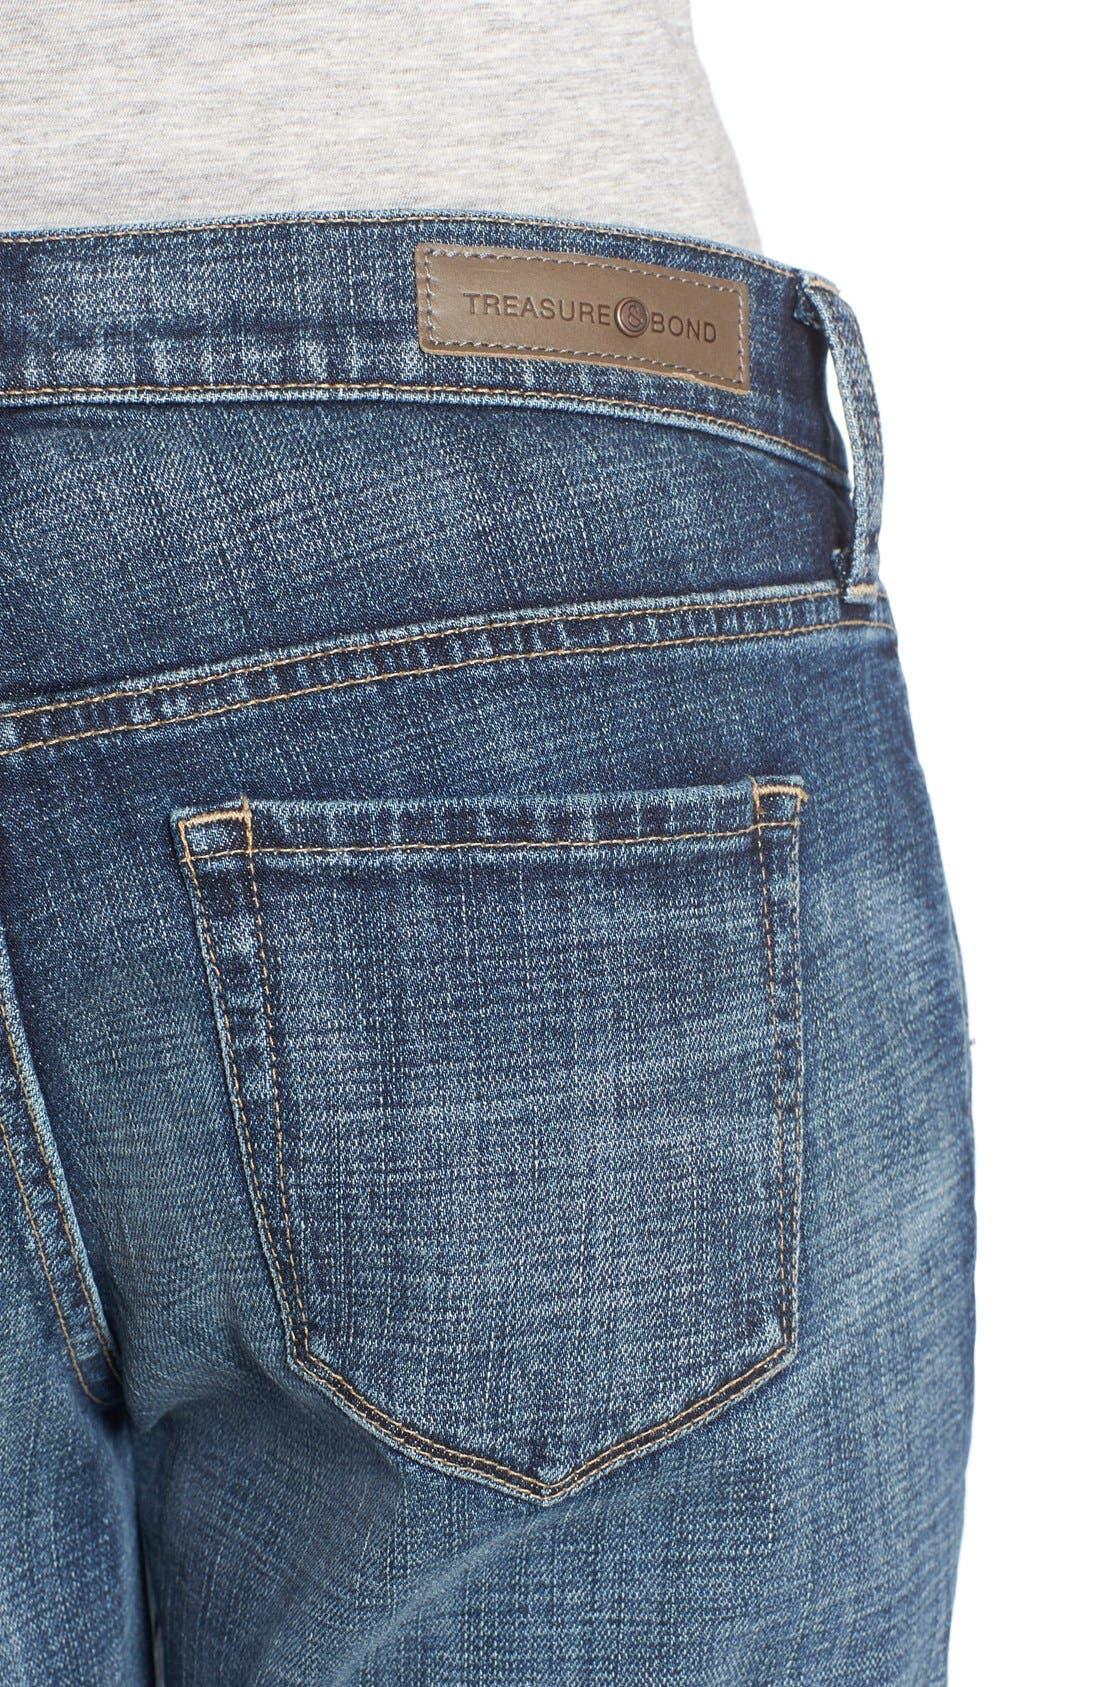 Alternate Image 4  - Treasure&Bond Ankle Boyfriend Jeans (Rustic Dusk Destroy)